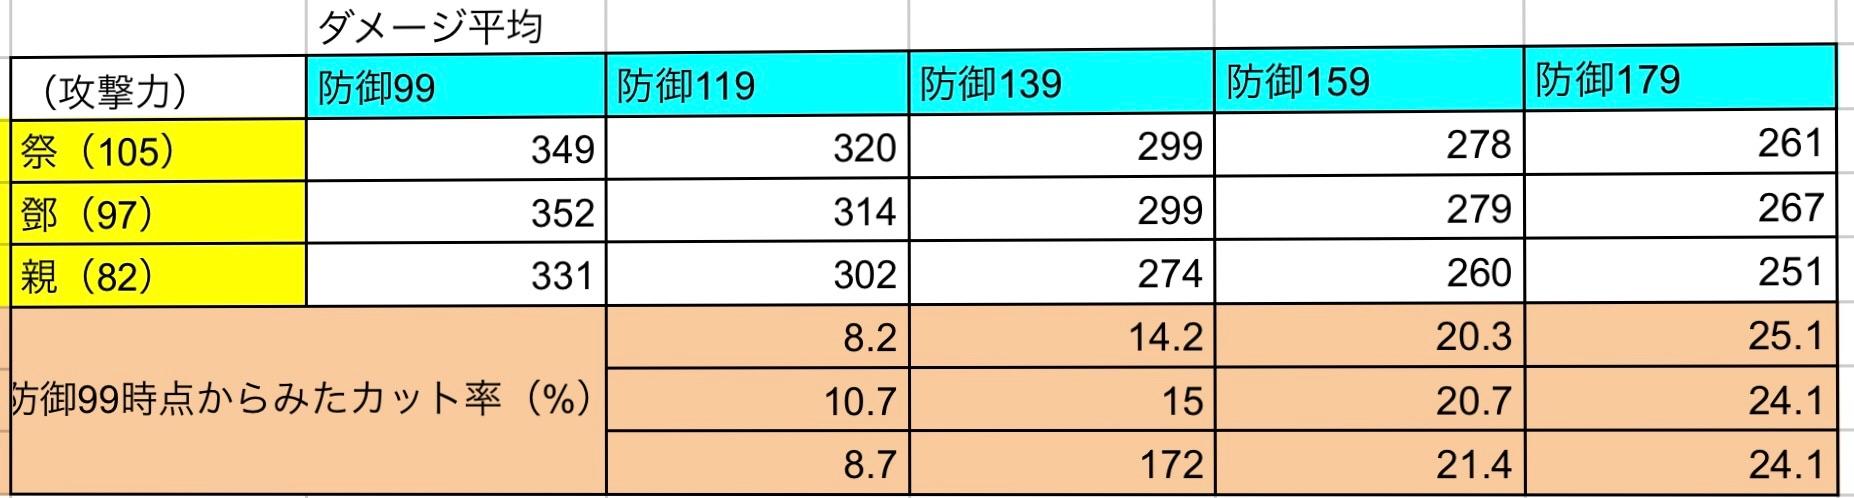 f:id:daisangokushimomimomi:20200328011546j:image